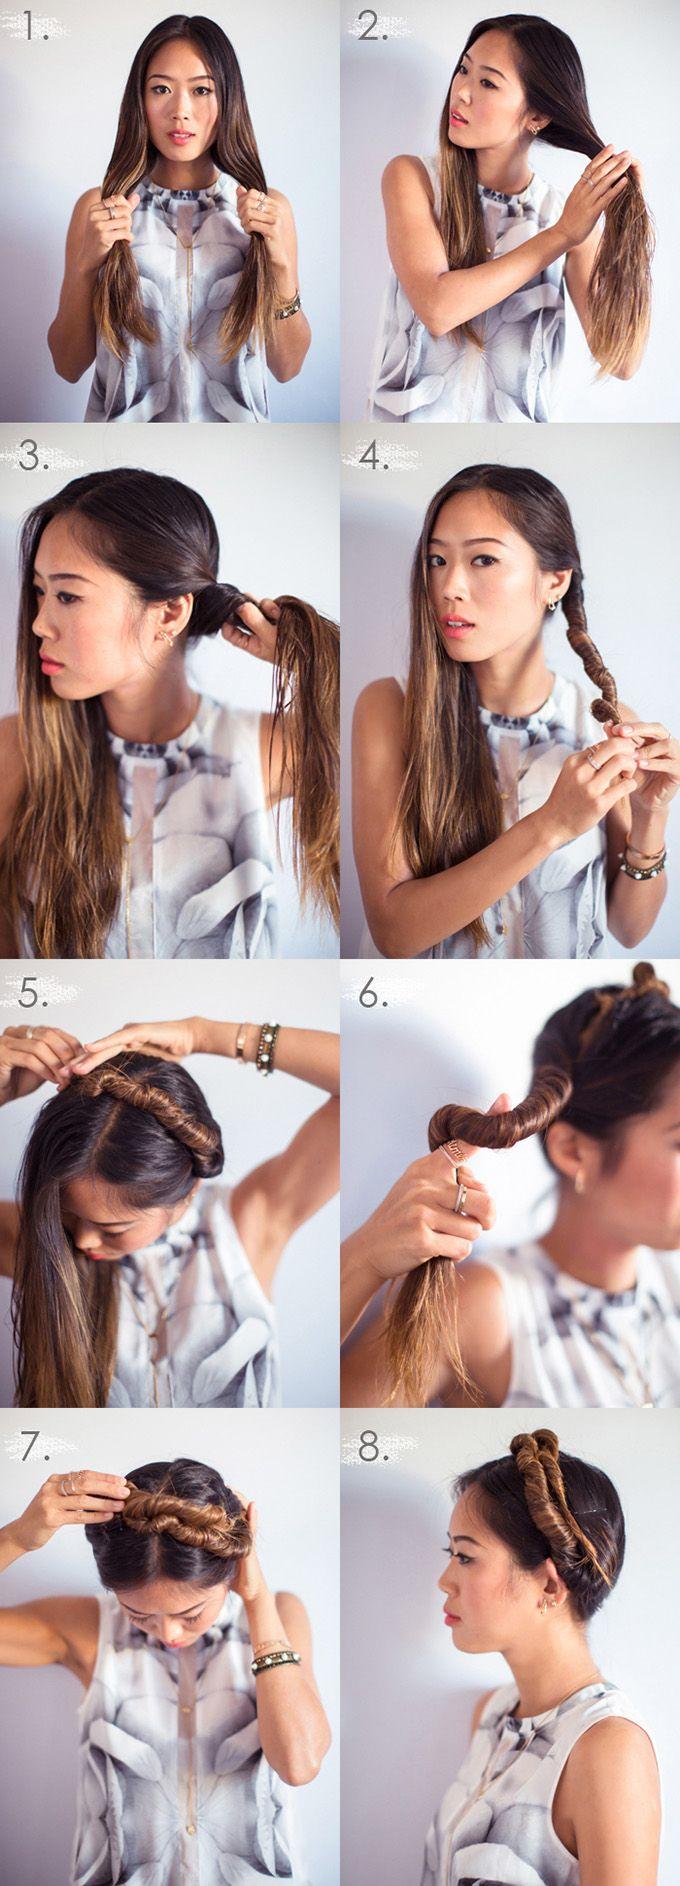 Truques rápidos para ondular os cabelos sem babyliss